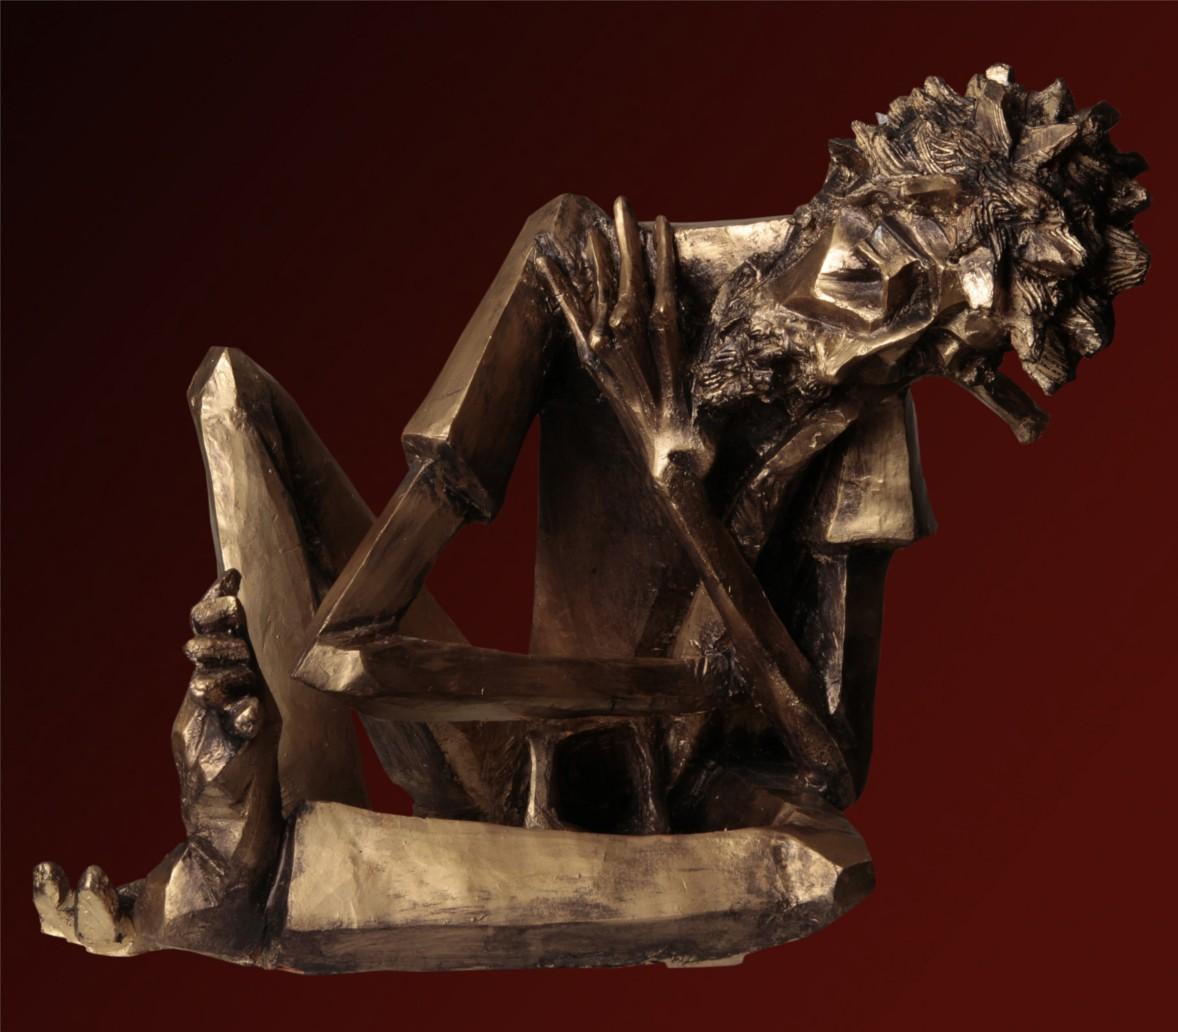 Suonatore Jazz - 40x46x50 cm, 2007)